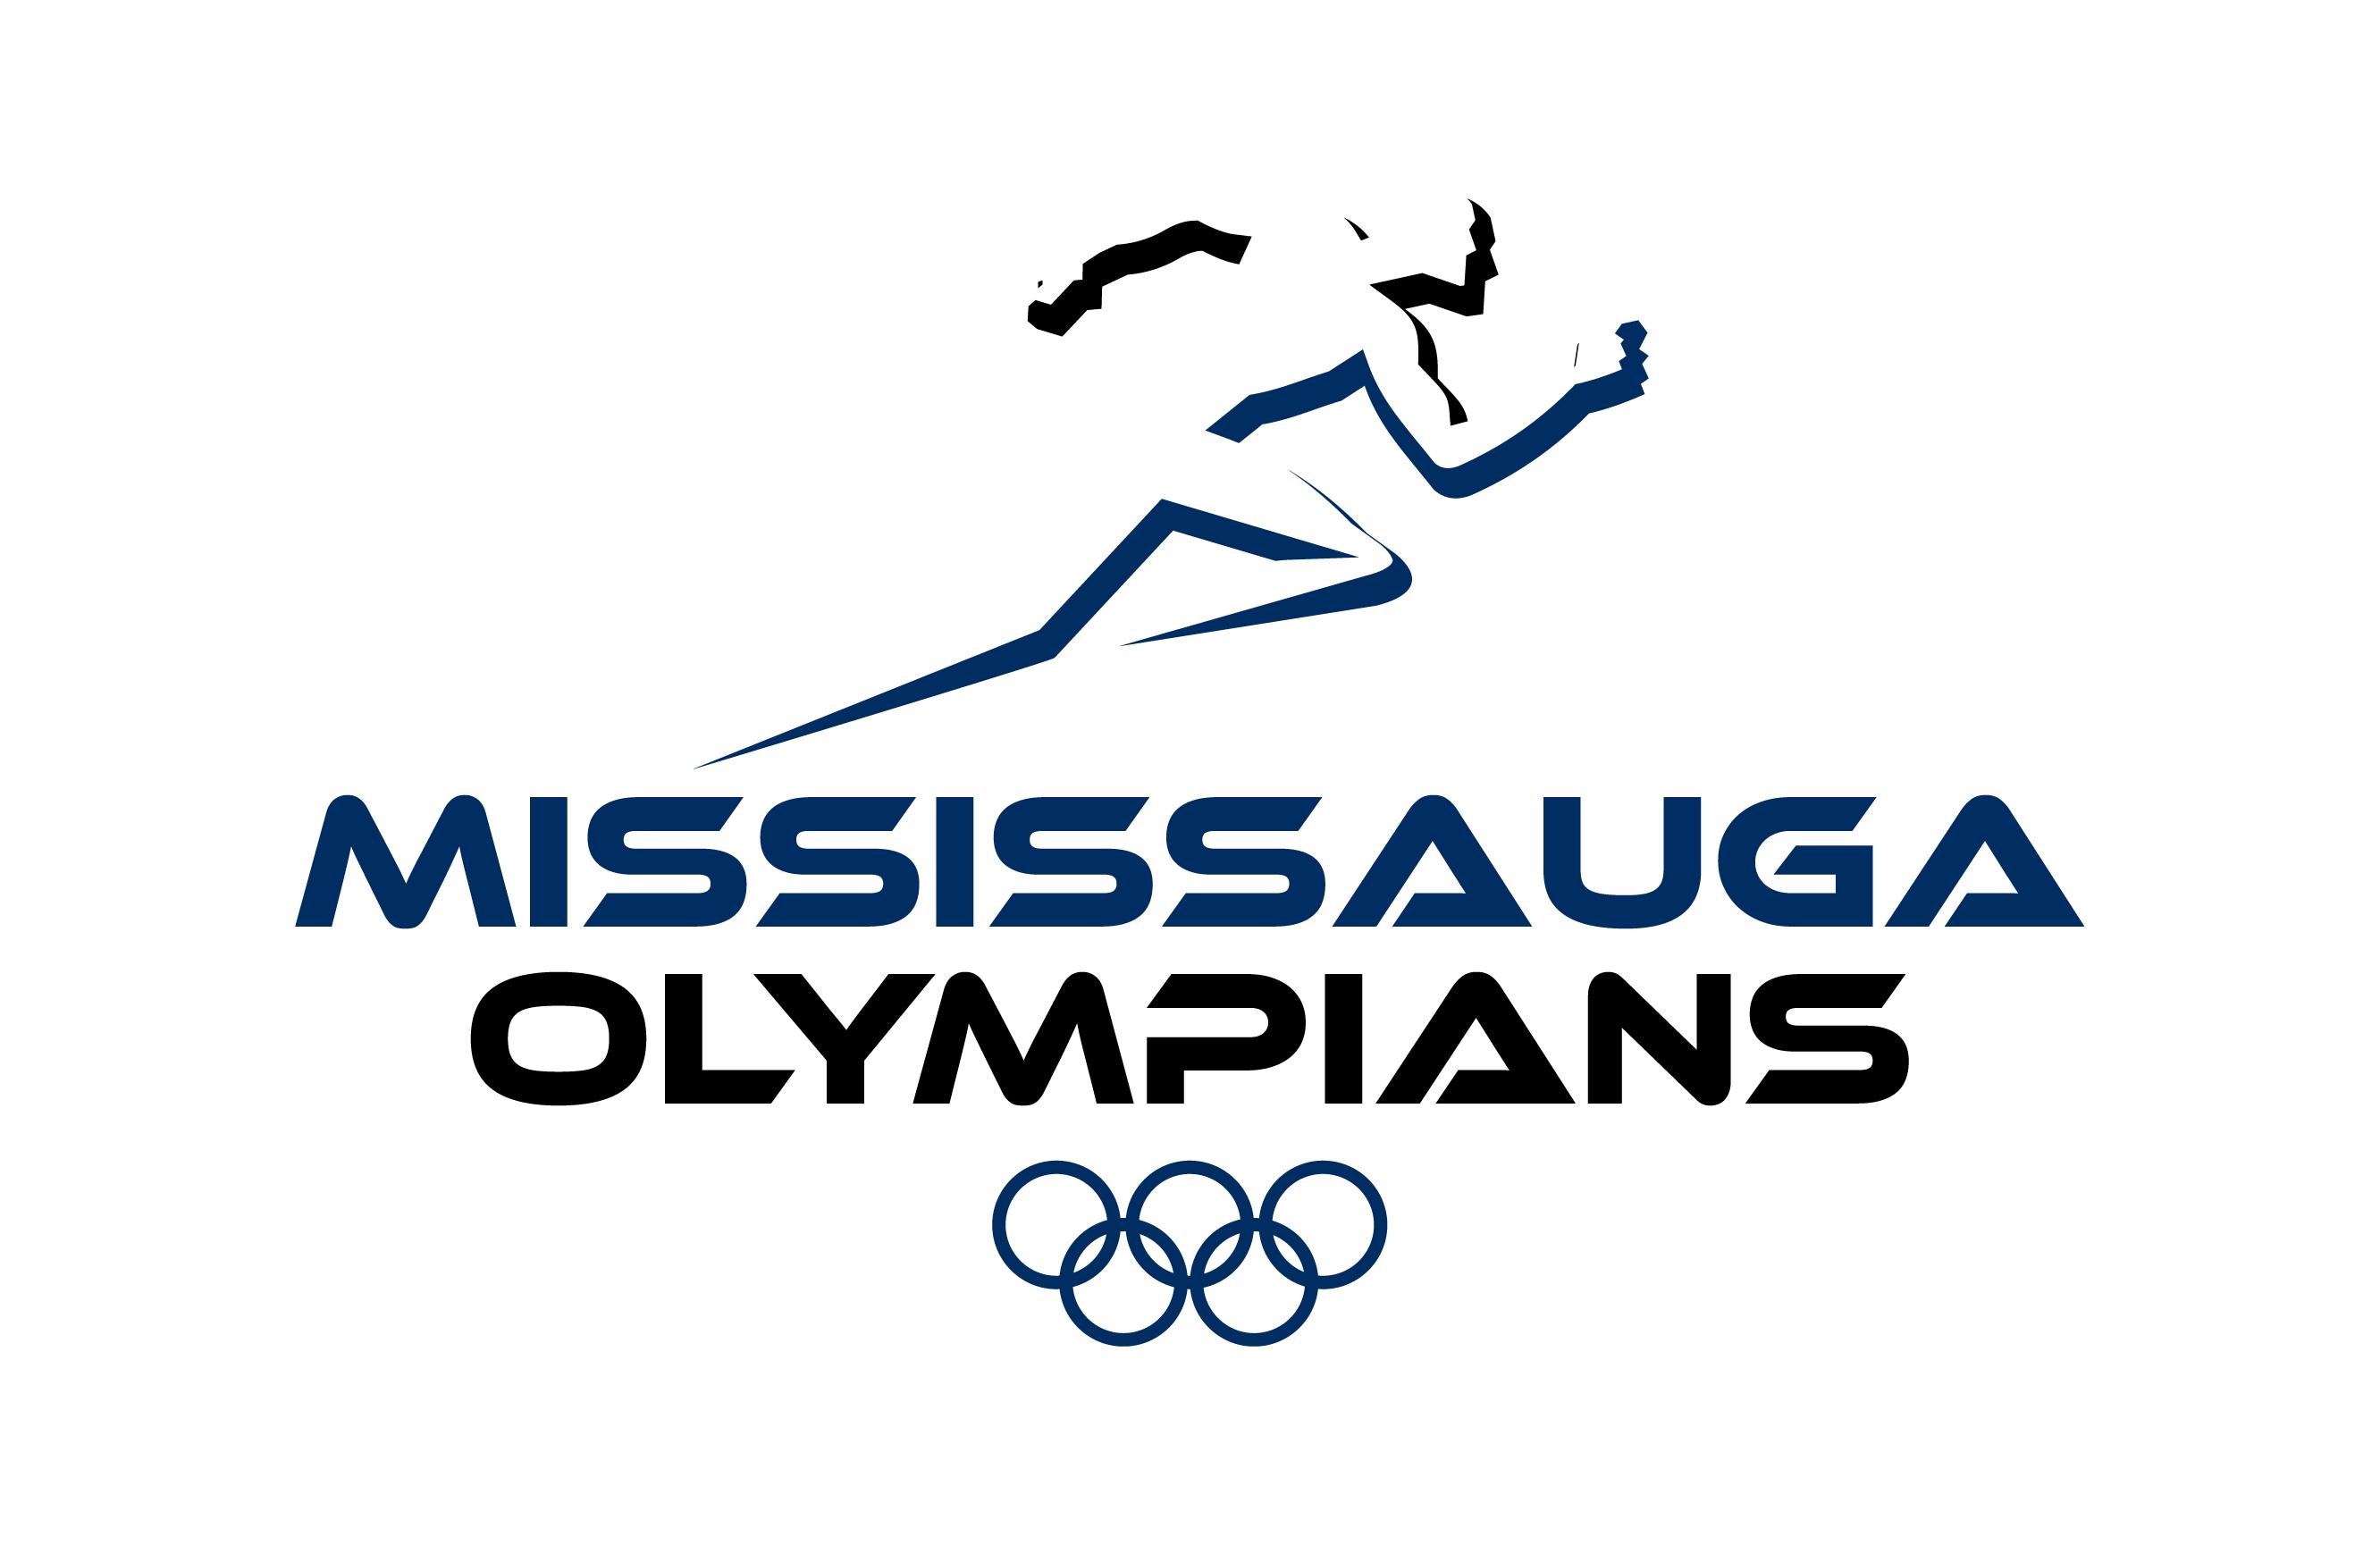 Mississauga Olympians